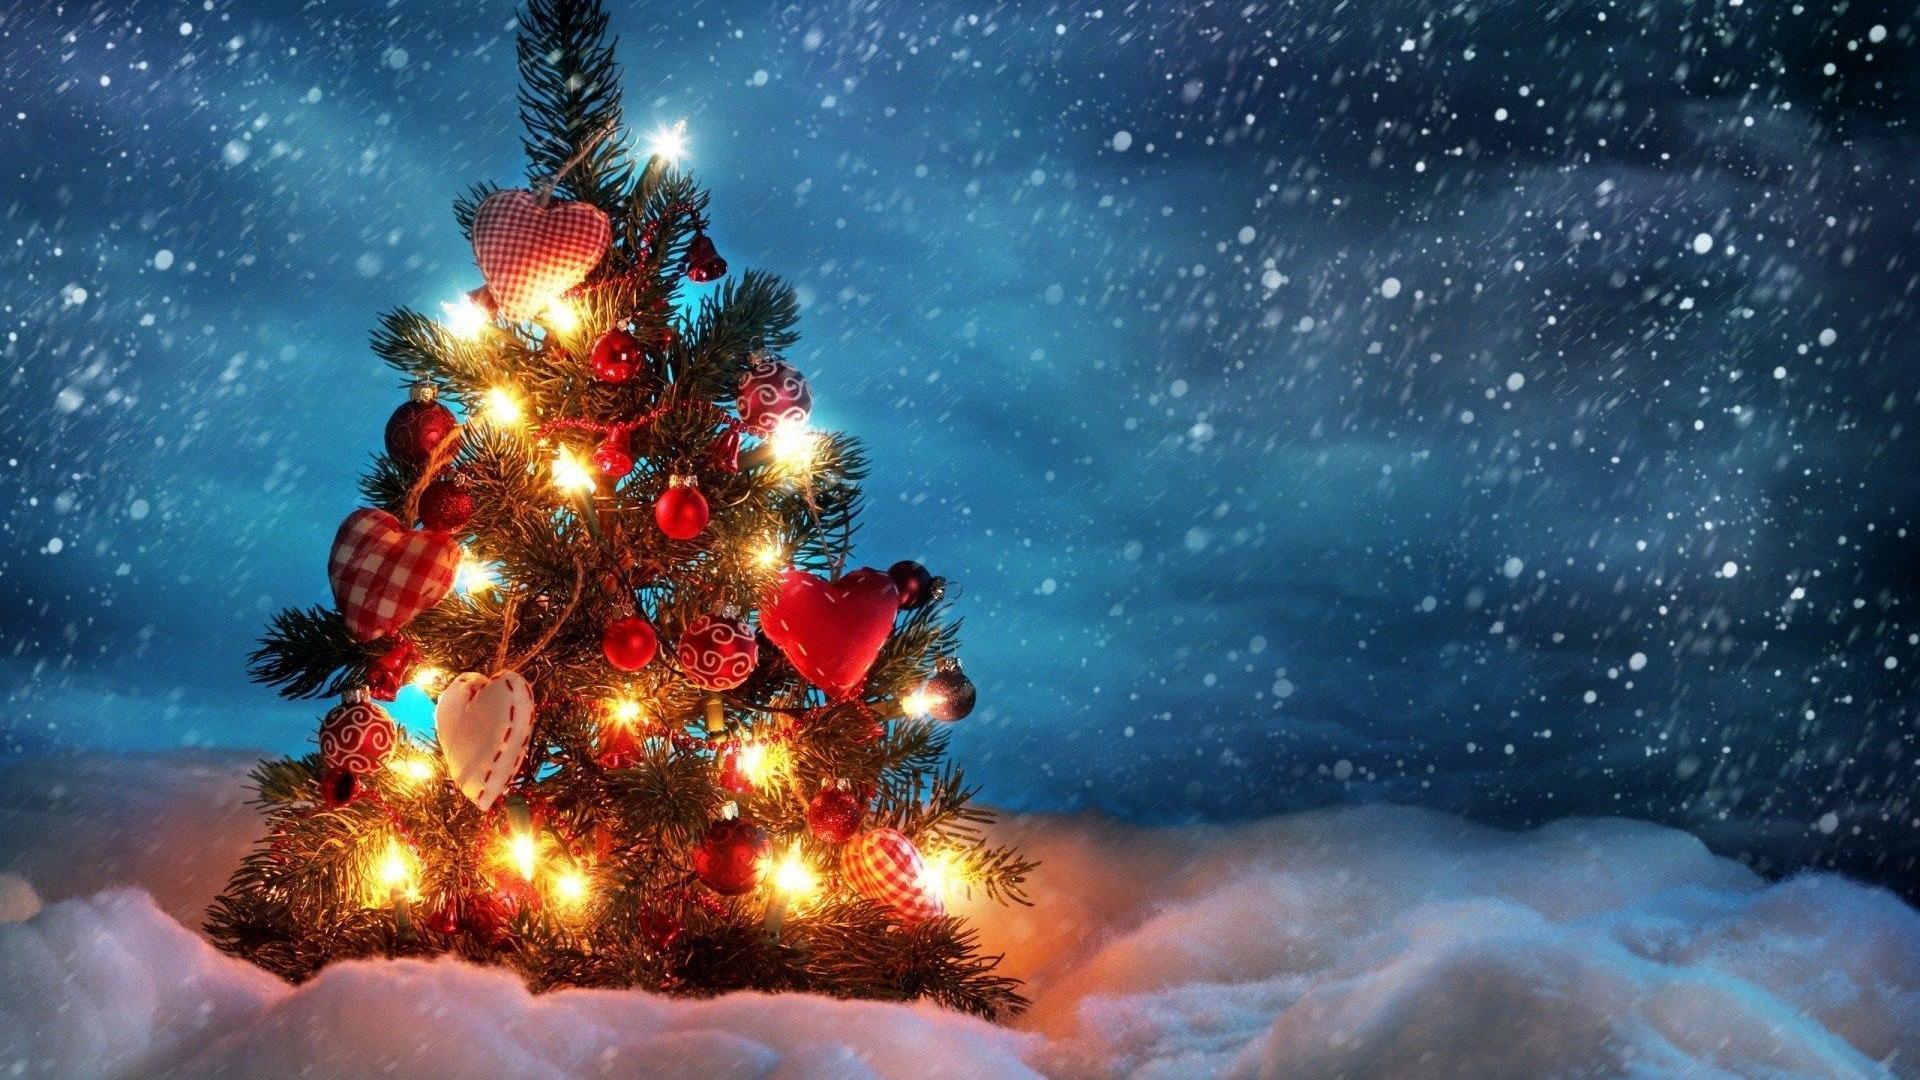 Free download 73 Desktop Christmas Wallpapers on